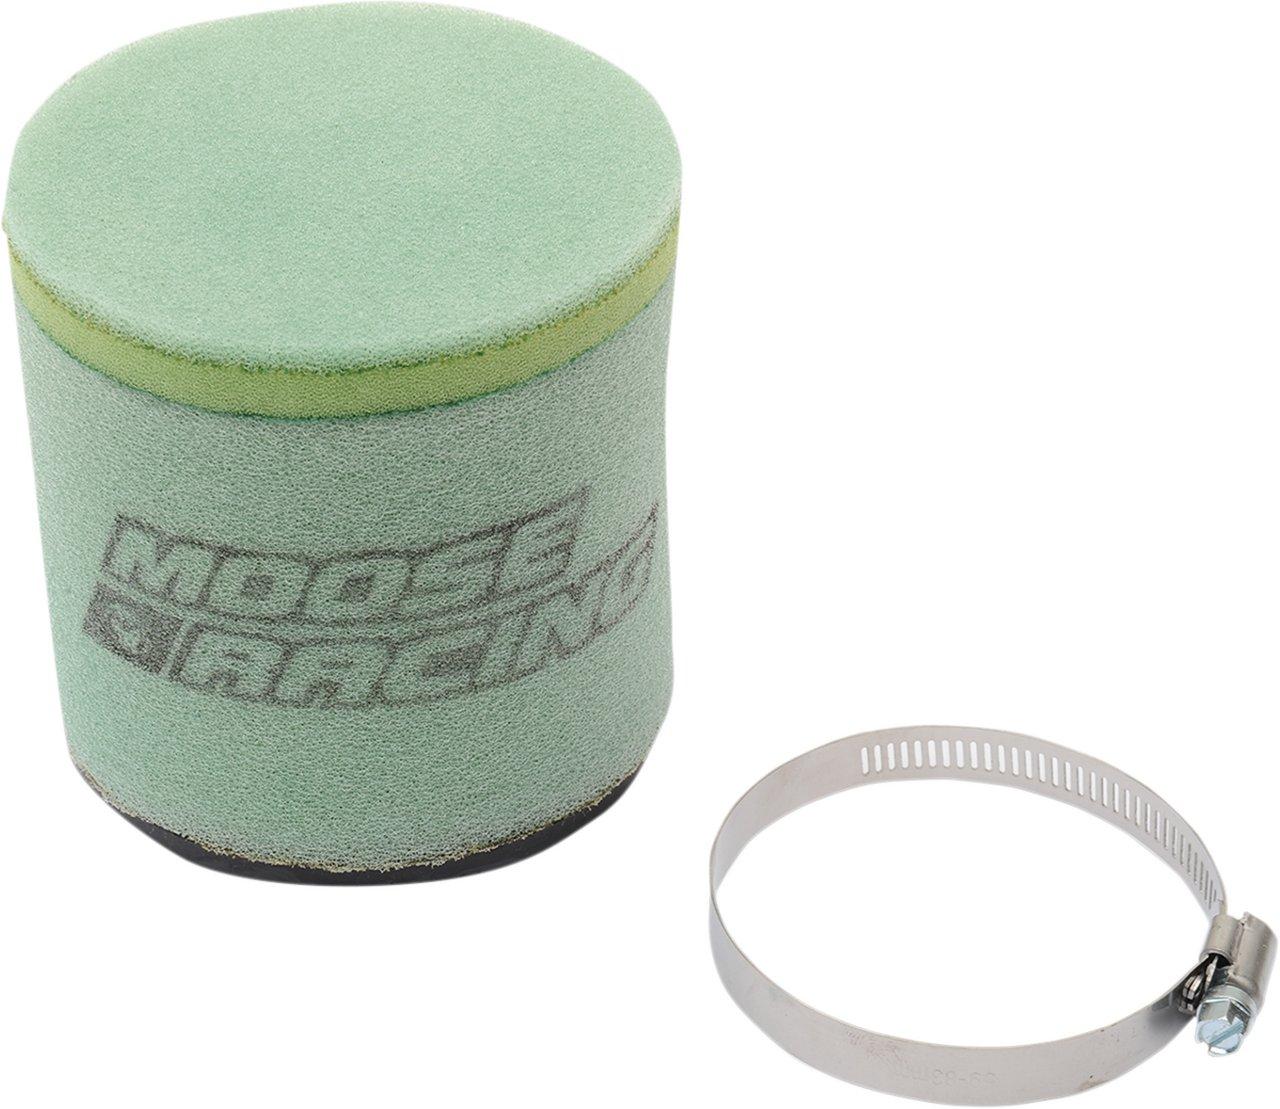 【MOOSE RACING】PPO (PRECISION PRE-OILED) 空氣濾芯 [1011-3714] - 「Webike-摩托百貨」